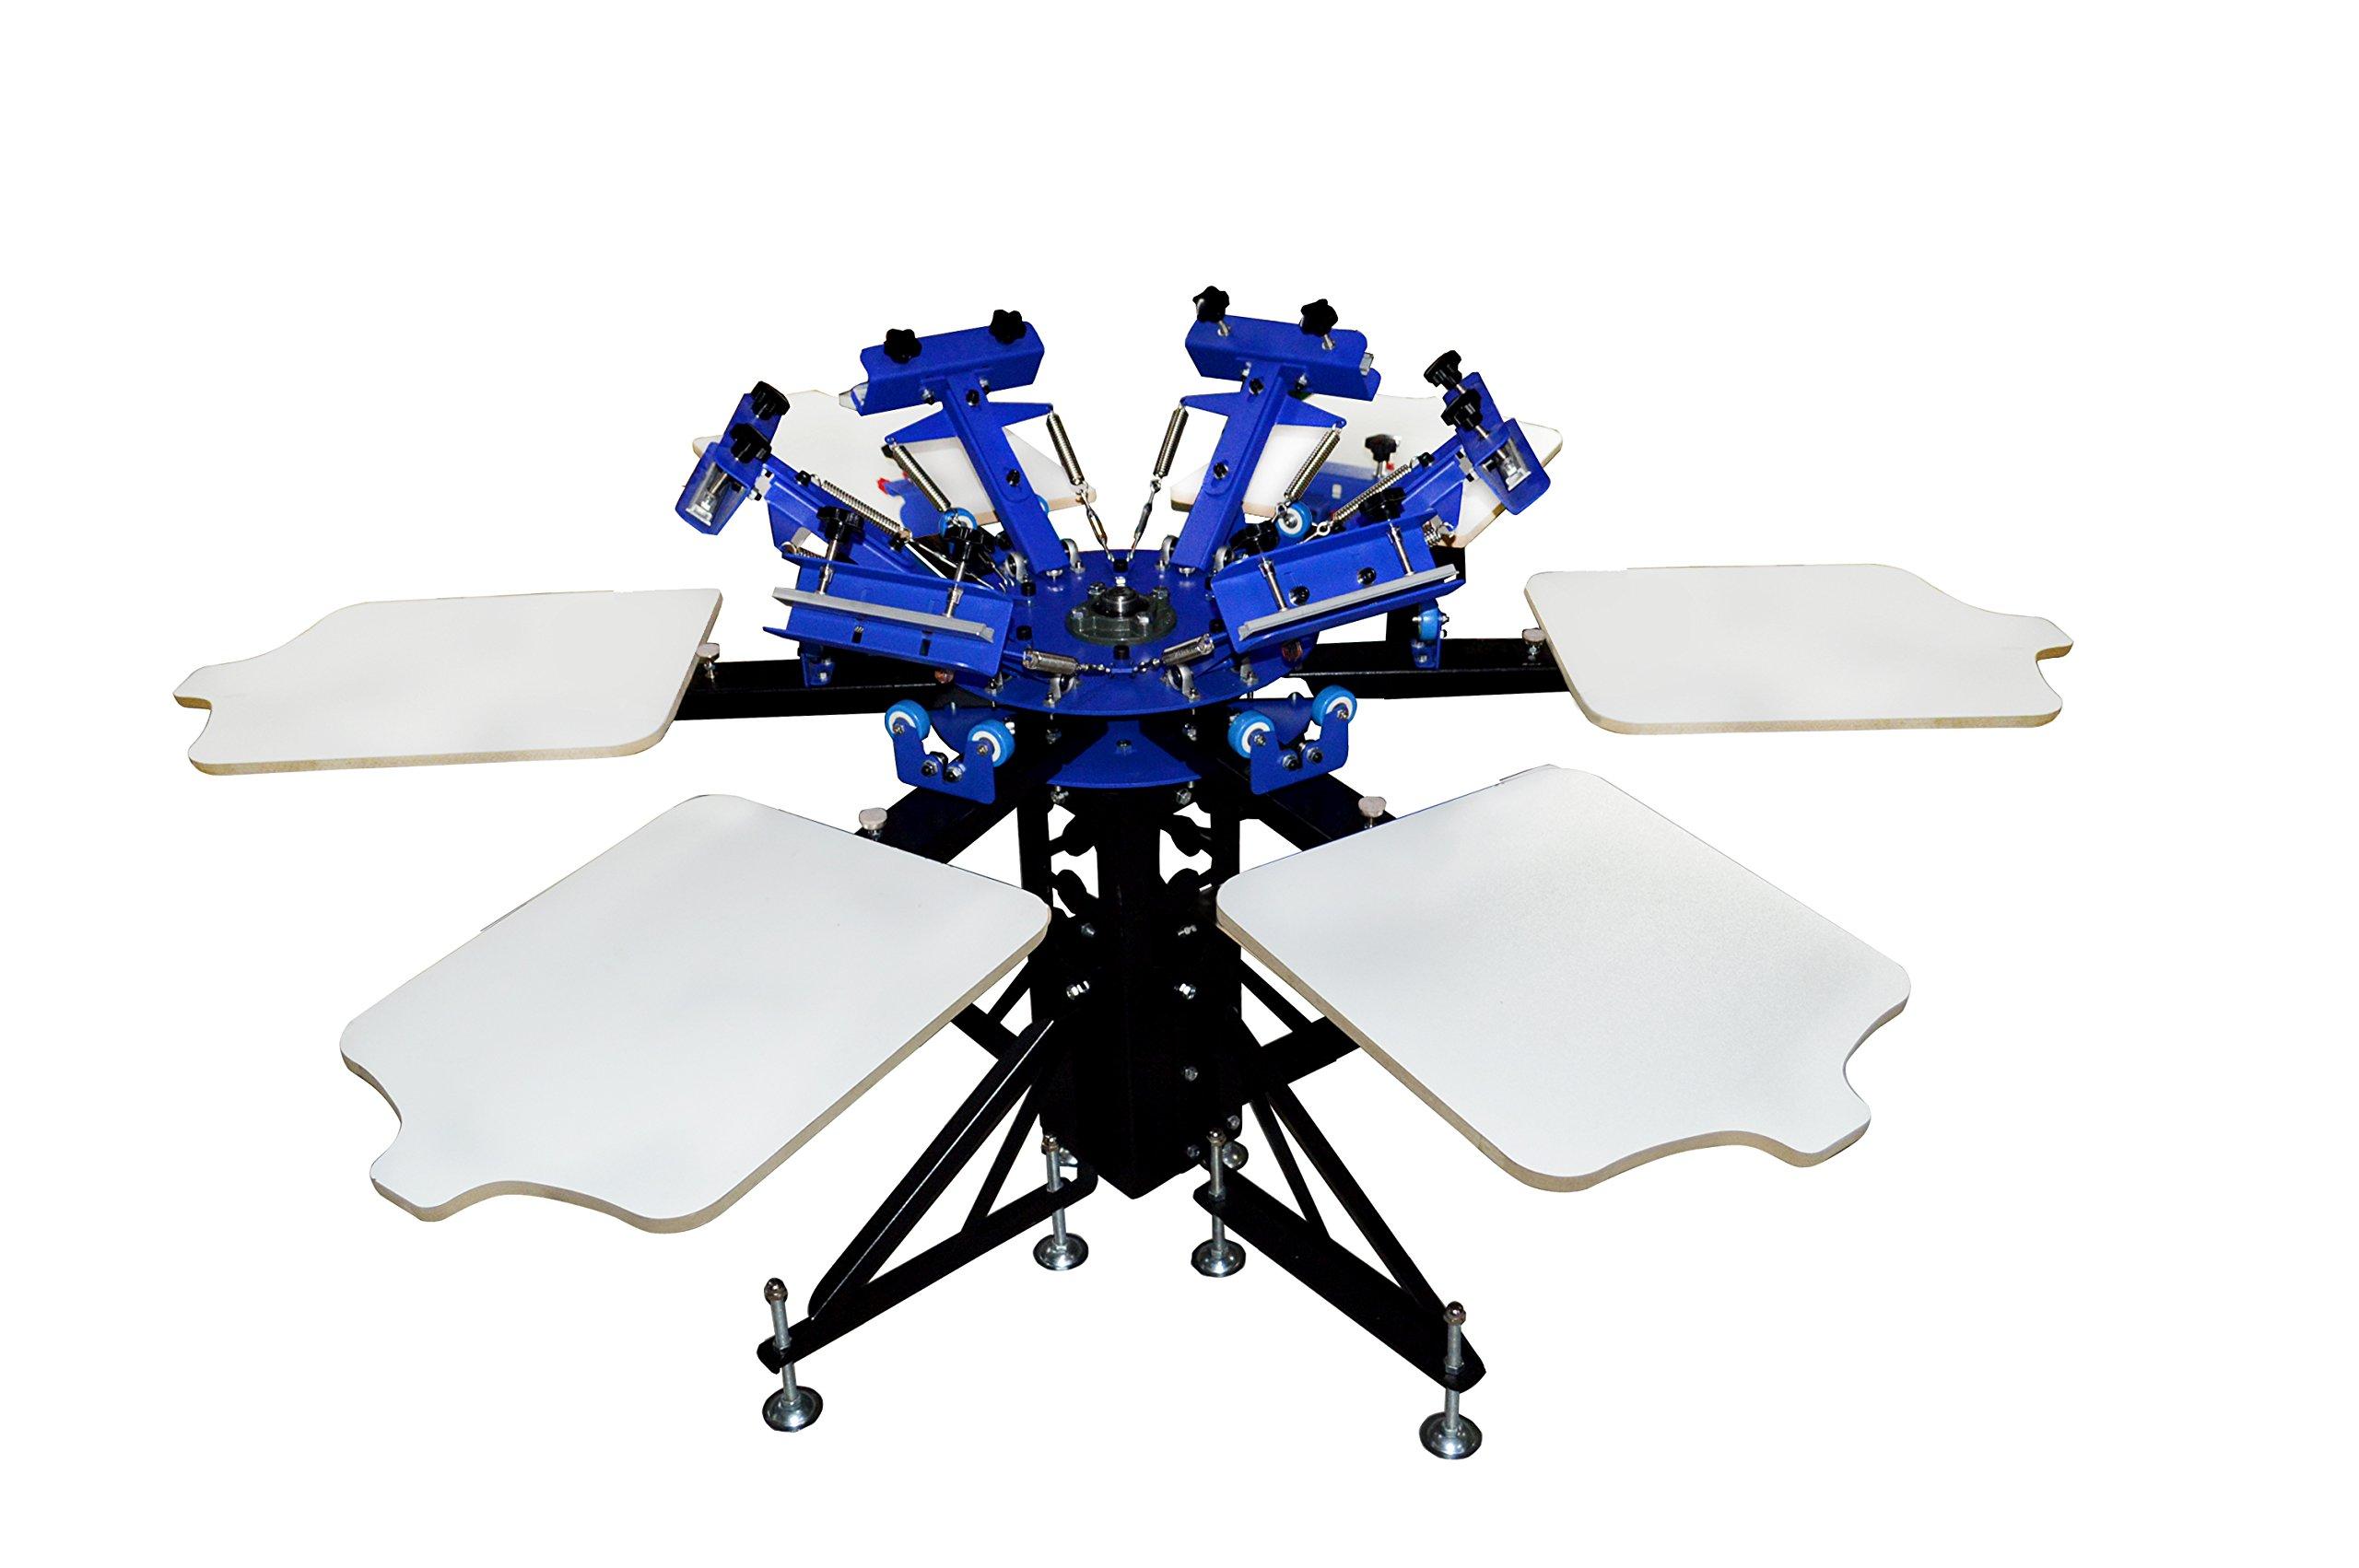 6-6 Double Wheel Screen Printing Machine Screen Printing Press DIY Equipment T-shirt by Screen Printing Machine Series